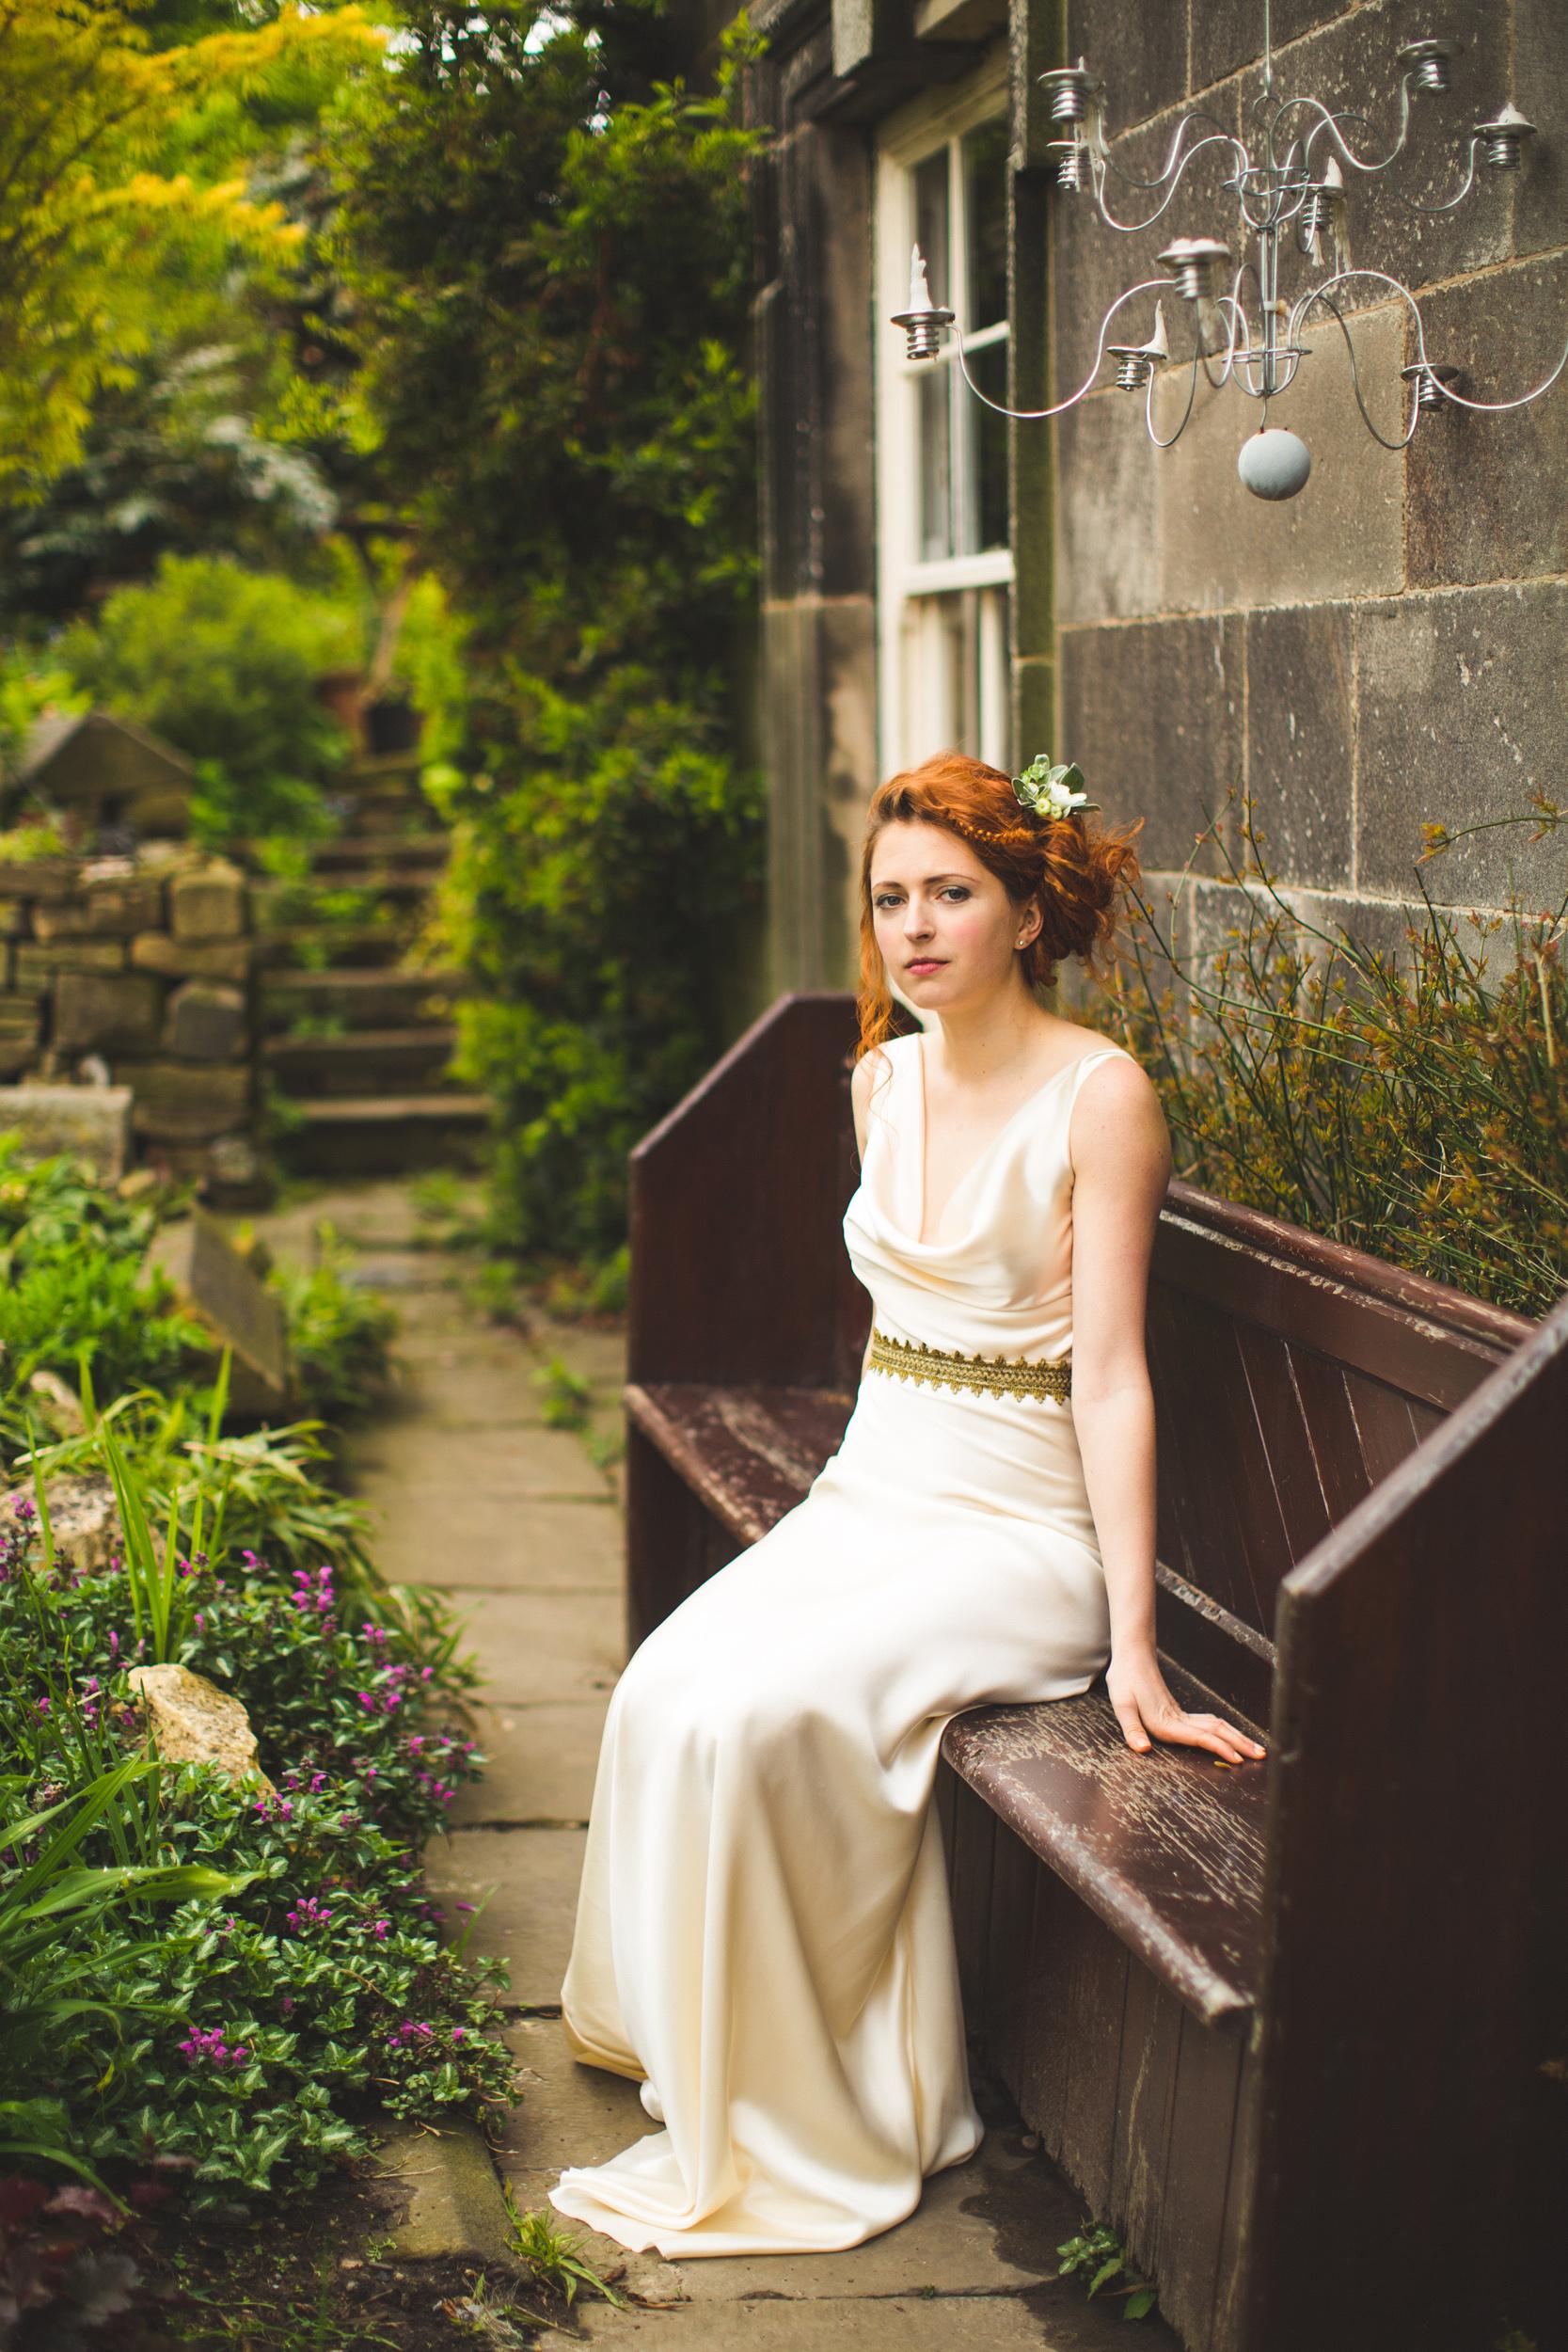 kate-beaumont-vintage-inspired-bridal-wedding-dresses-Sheffield-S6-11.jpg